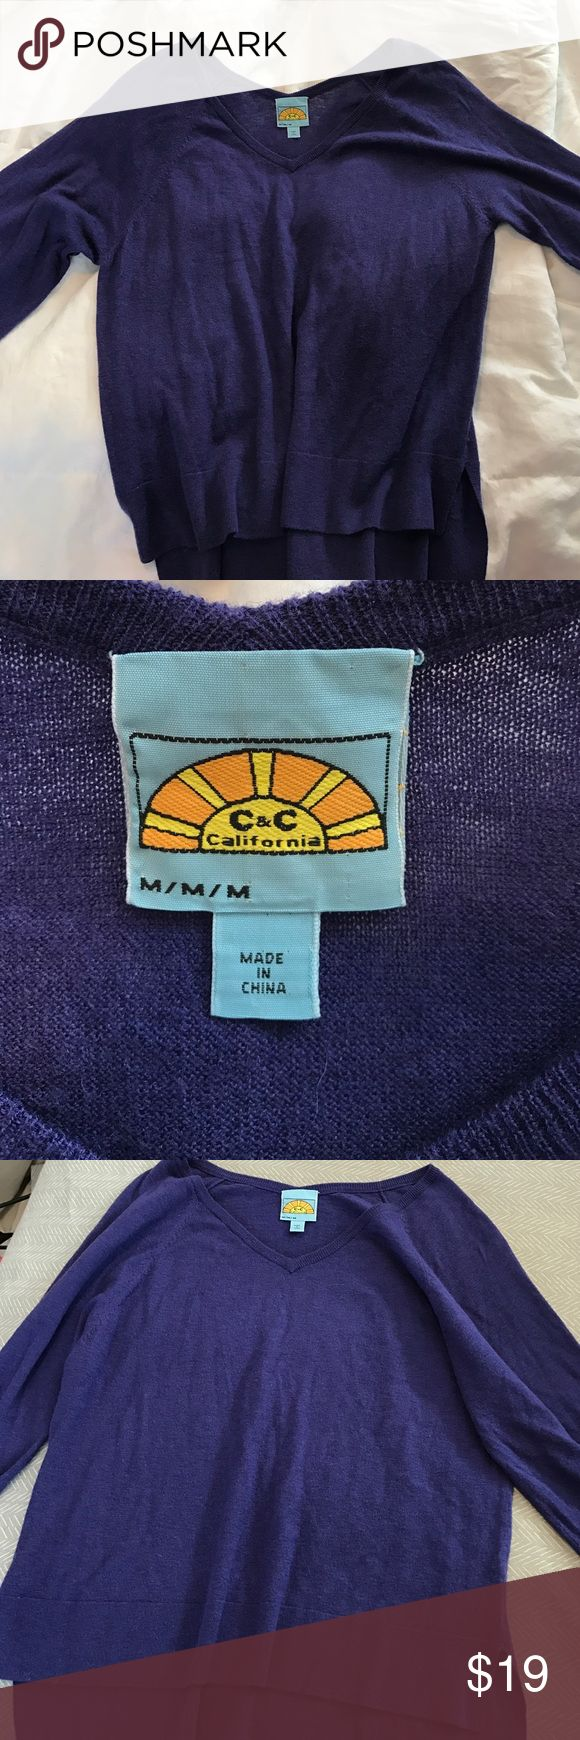 C&C California sweater Purple, worn less than 5 times, loose fit, super soft C&C California Sweaters V-Necks